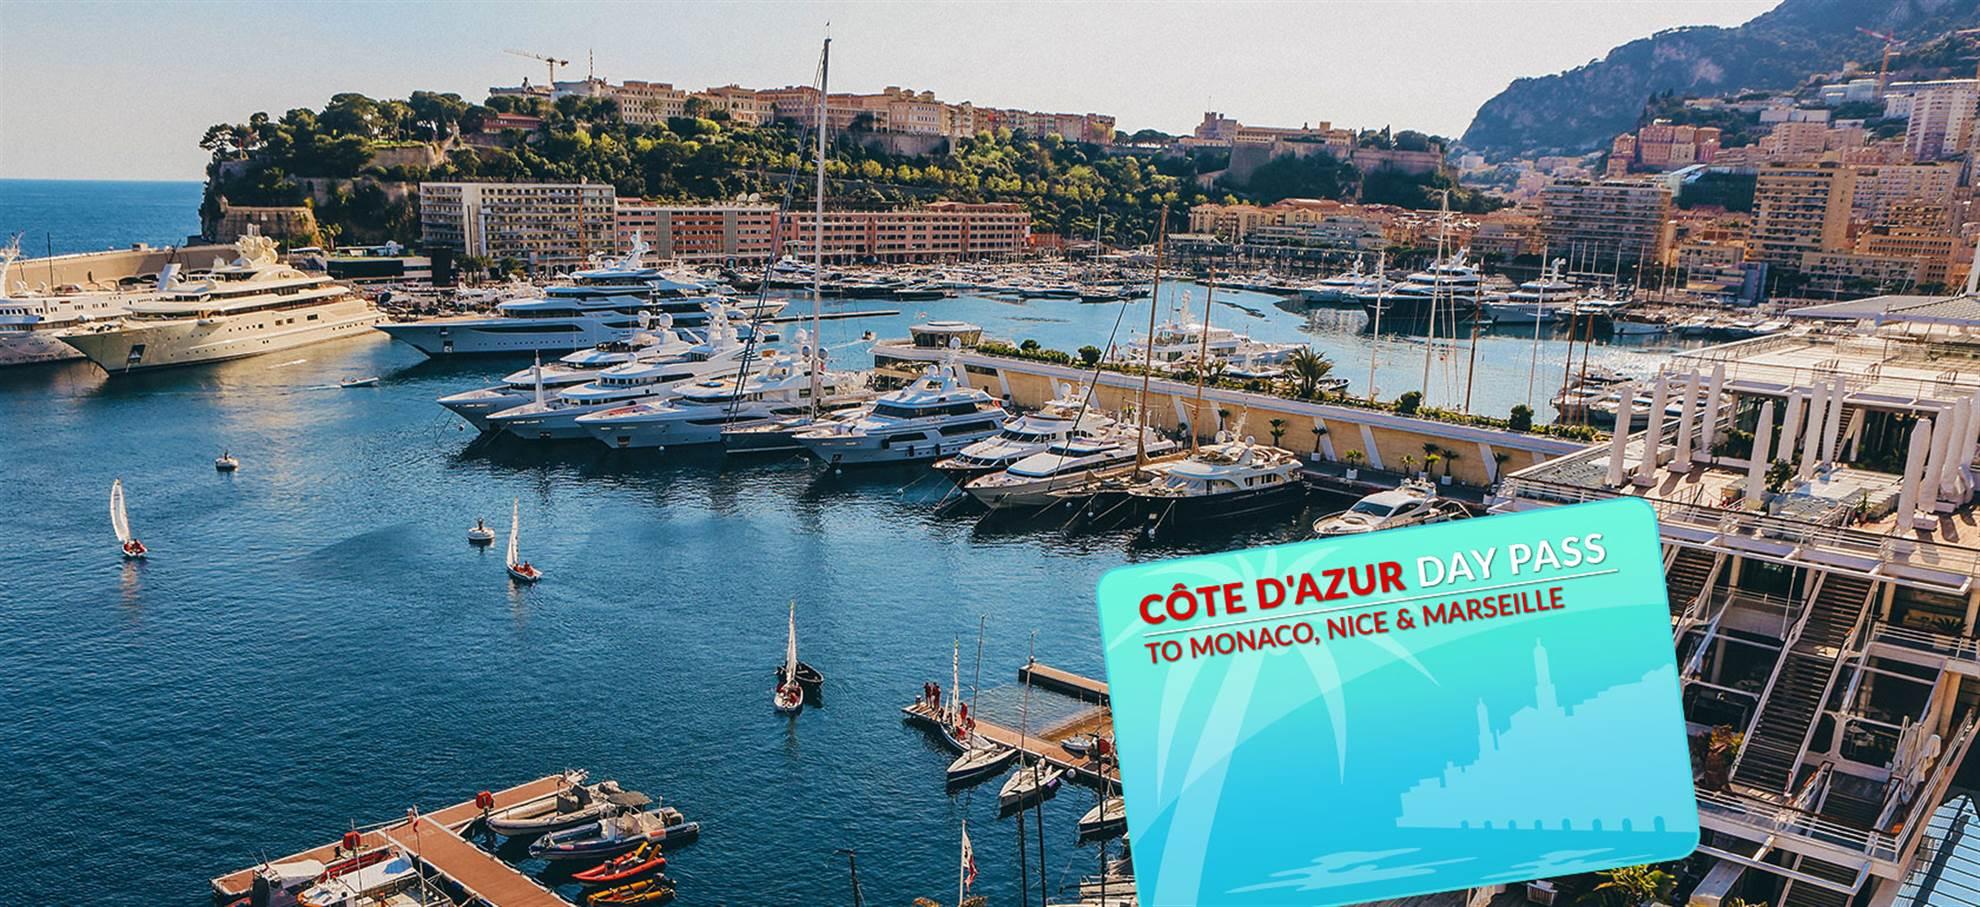 Passaporte Riviera Francesa para Marselha/Nice/Mônaco